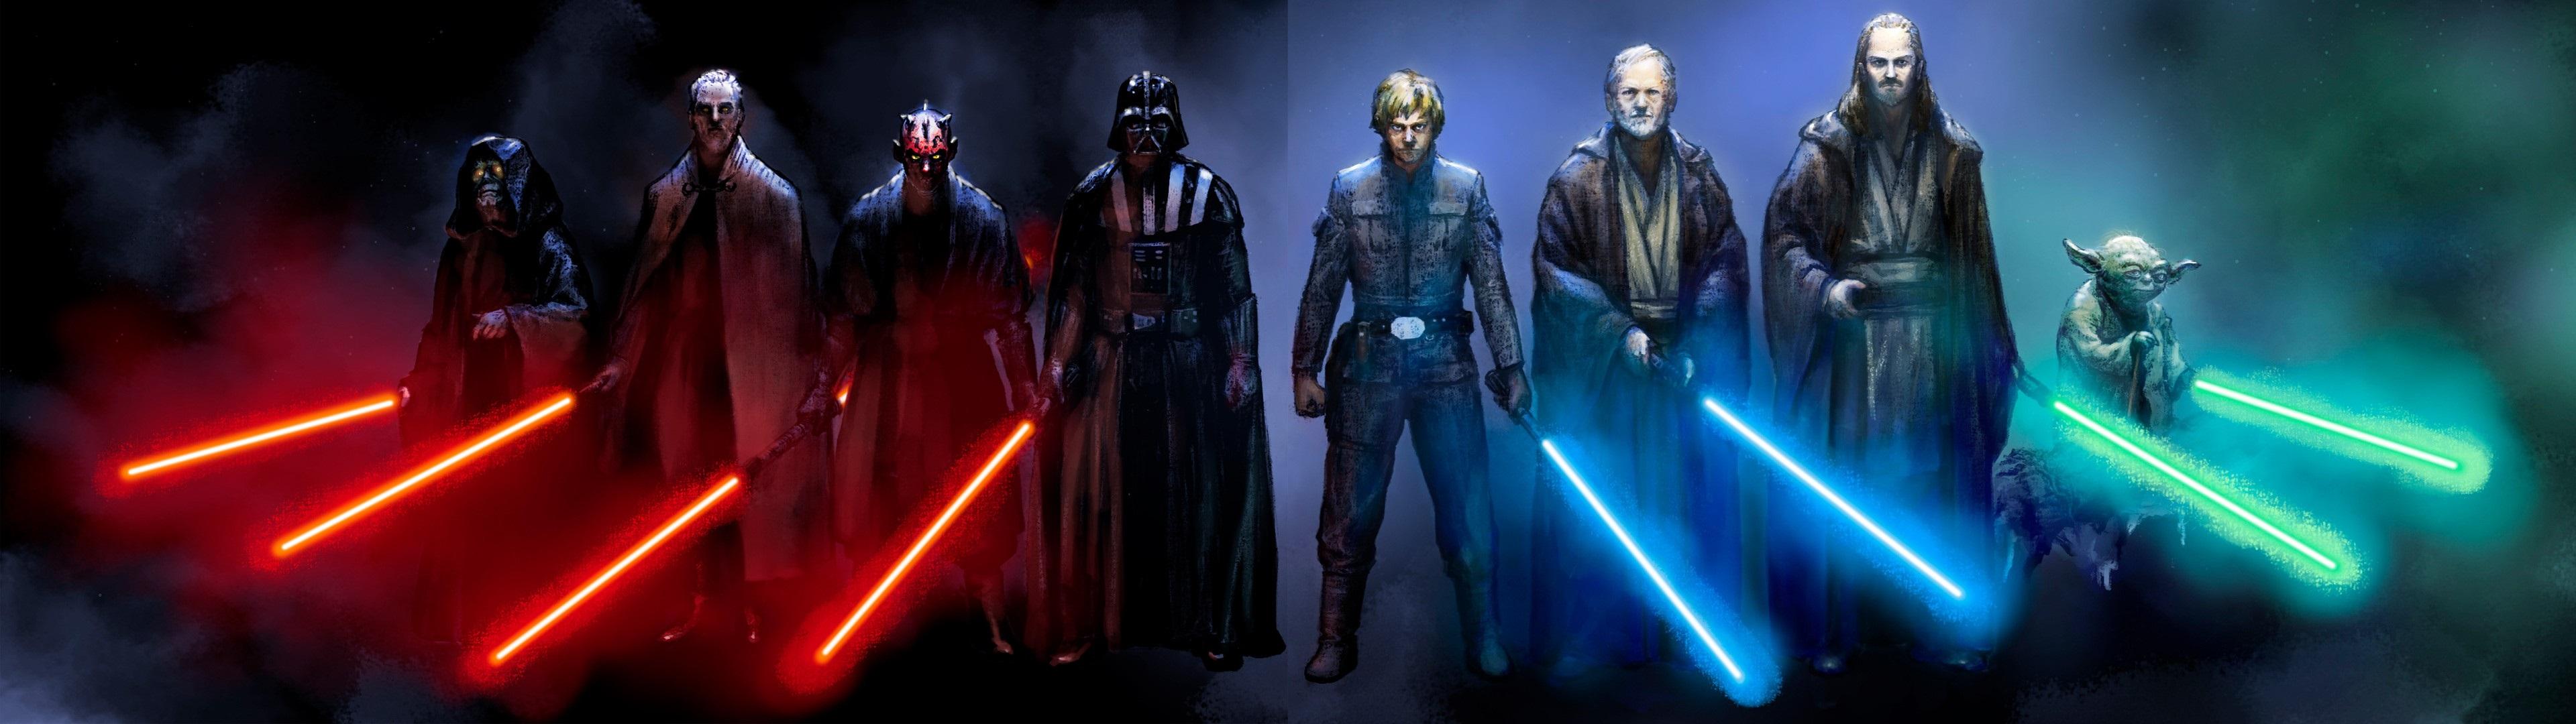 3840x1080 Wallpaper Star Wars - WallpaperSafari